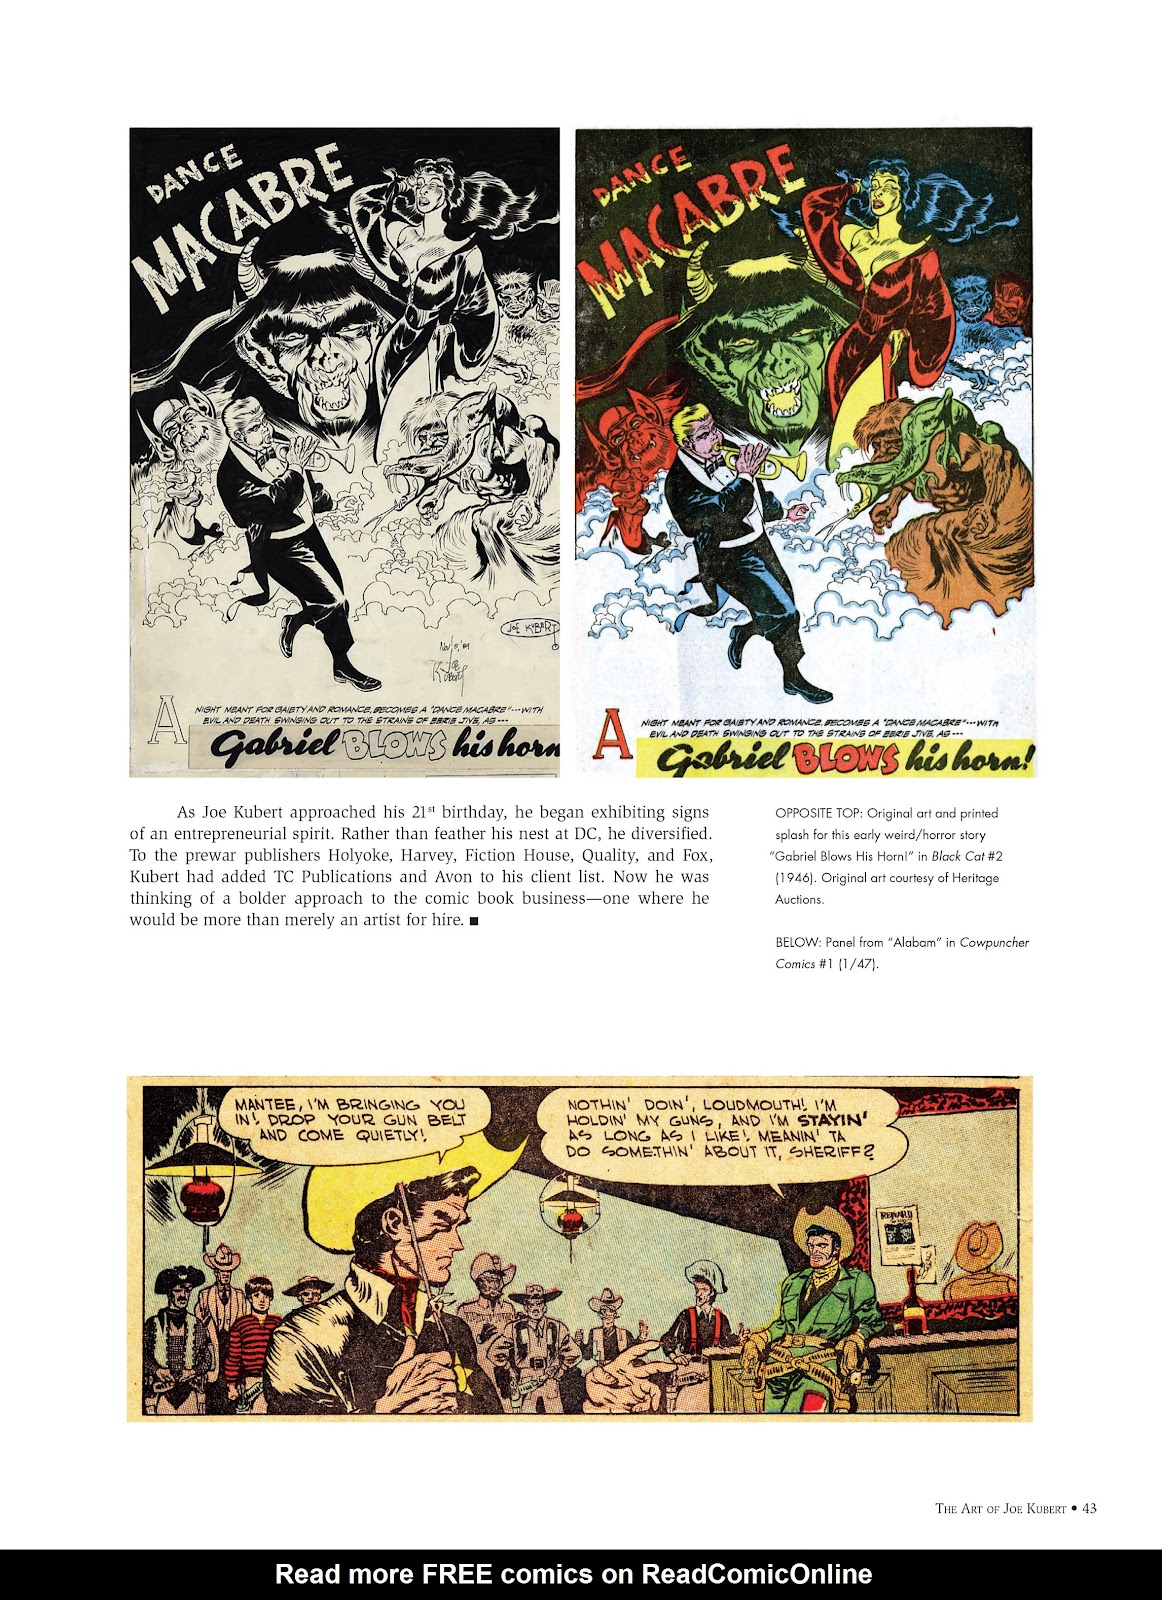 Read online The Art of Joe Kubert comic -  Issue # TPB (Part 1) - 42